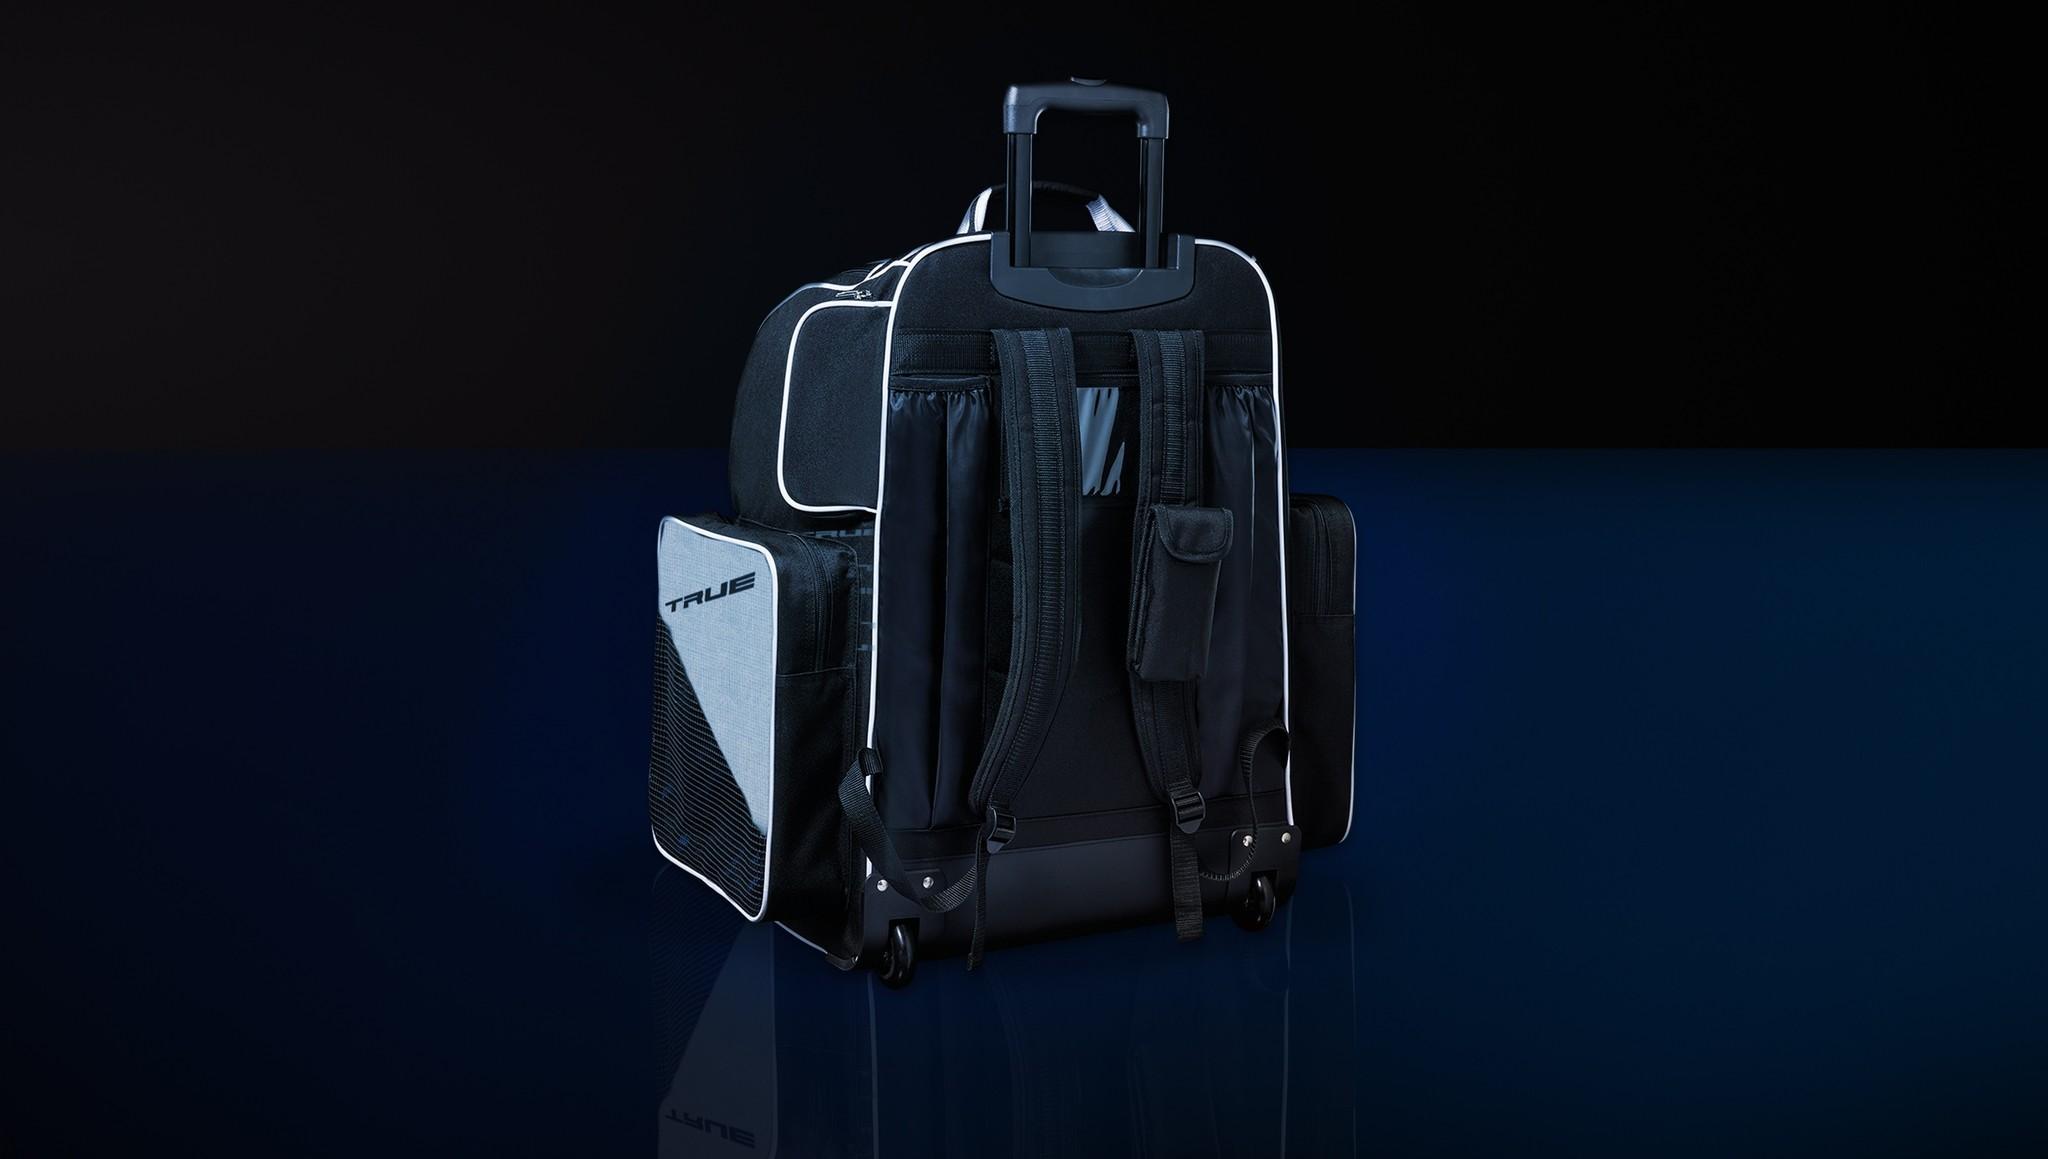 True TRUE ROLLER BACKPACK BAGS